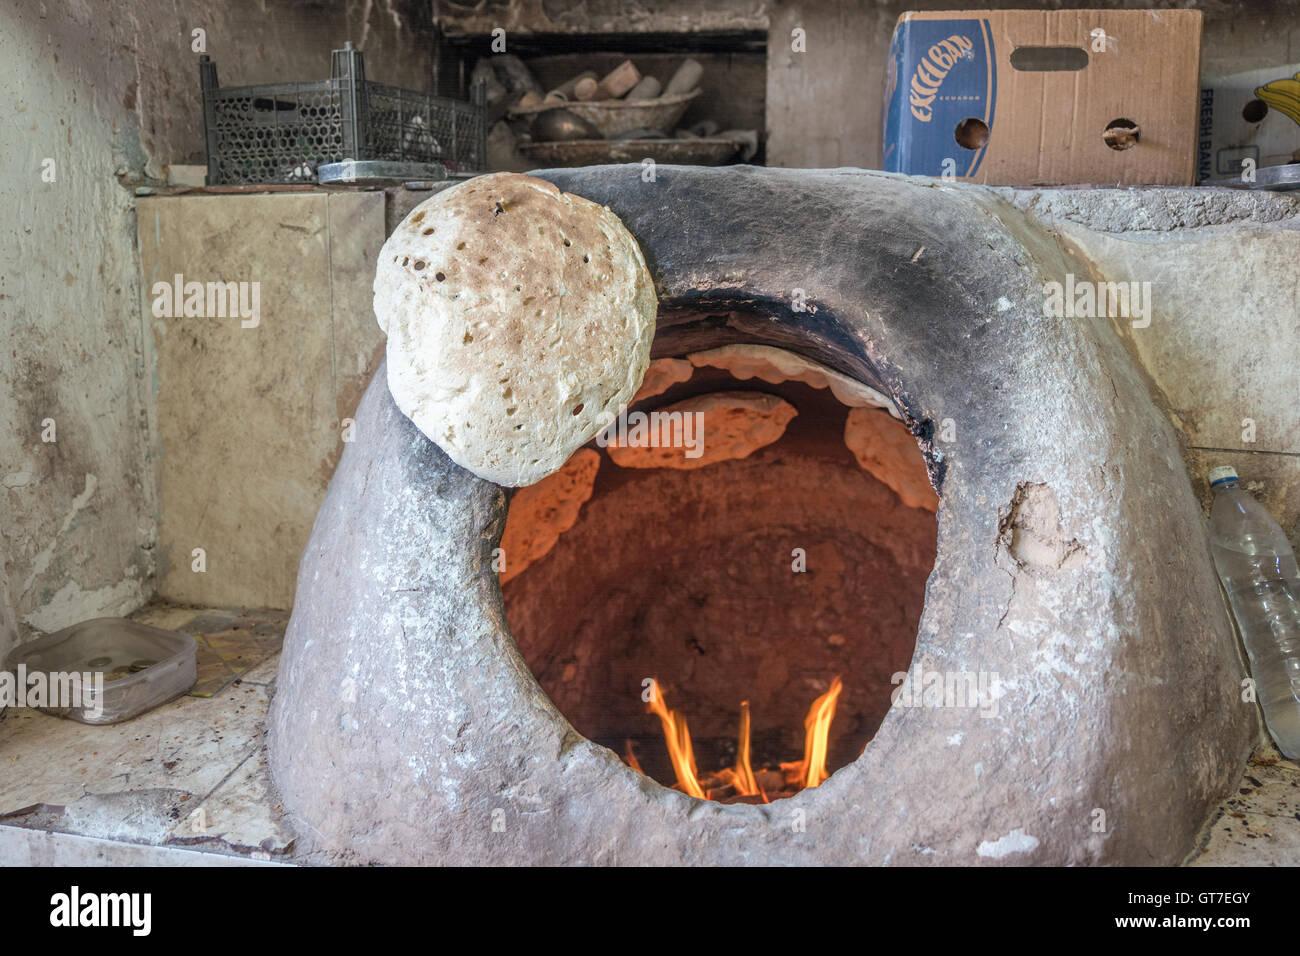 A baker uses a tandoori oven to bake fresh taftoon bread in Yazd, Iran. Stock Photo